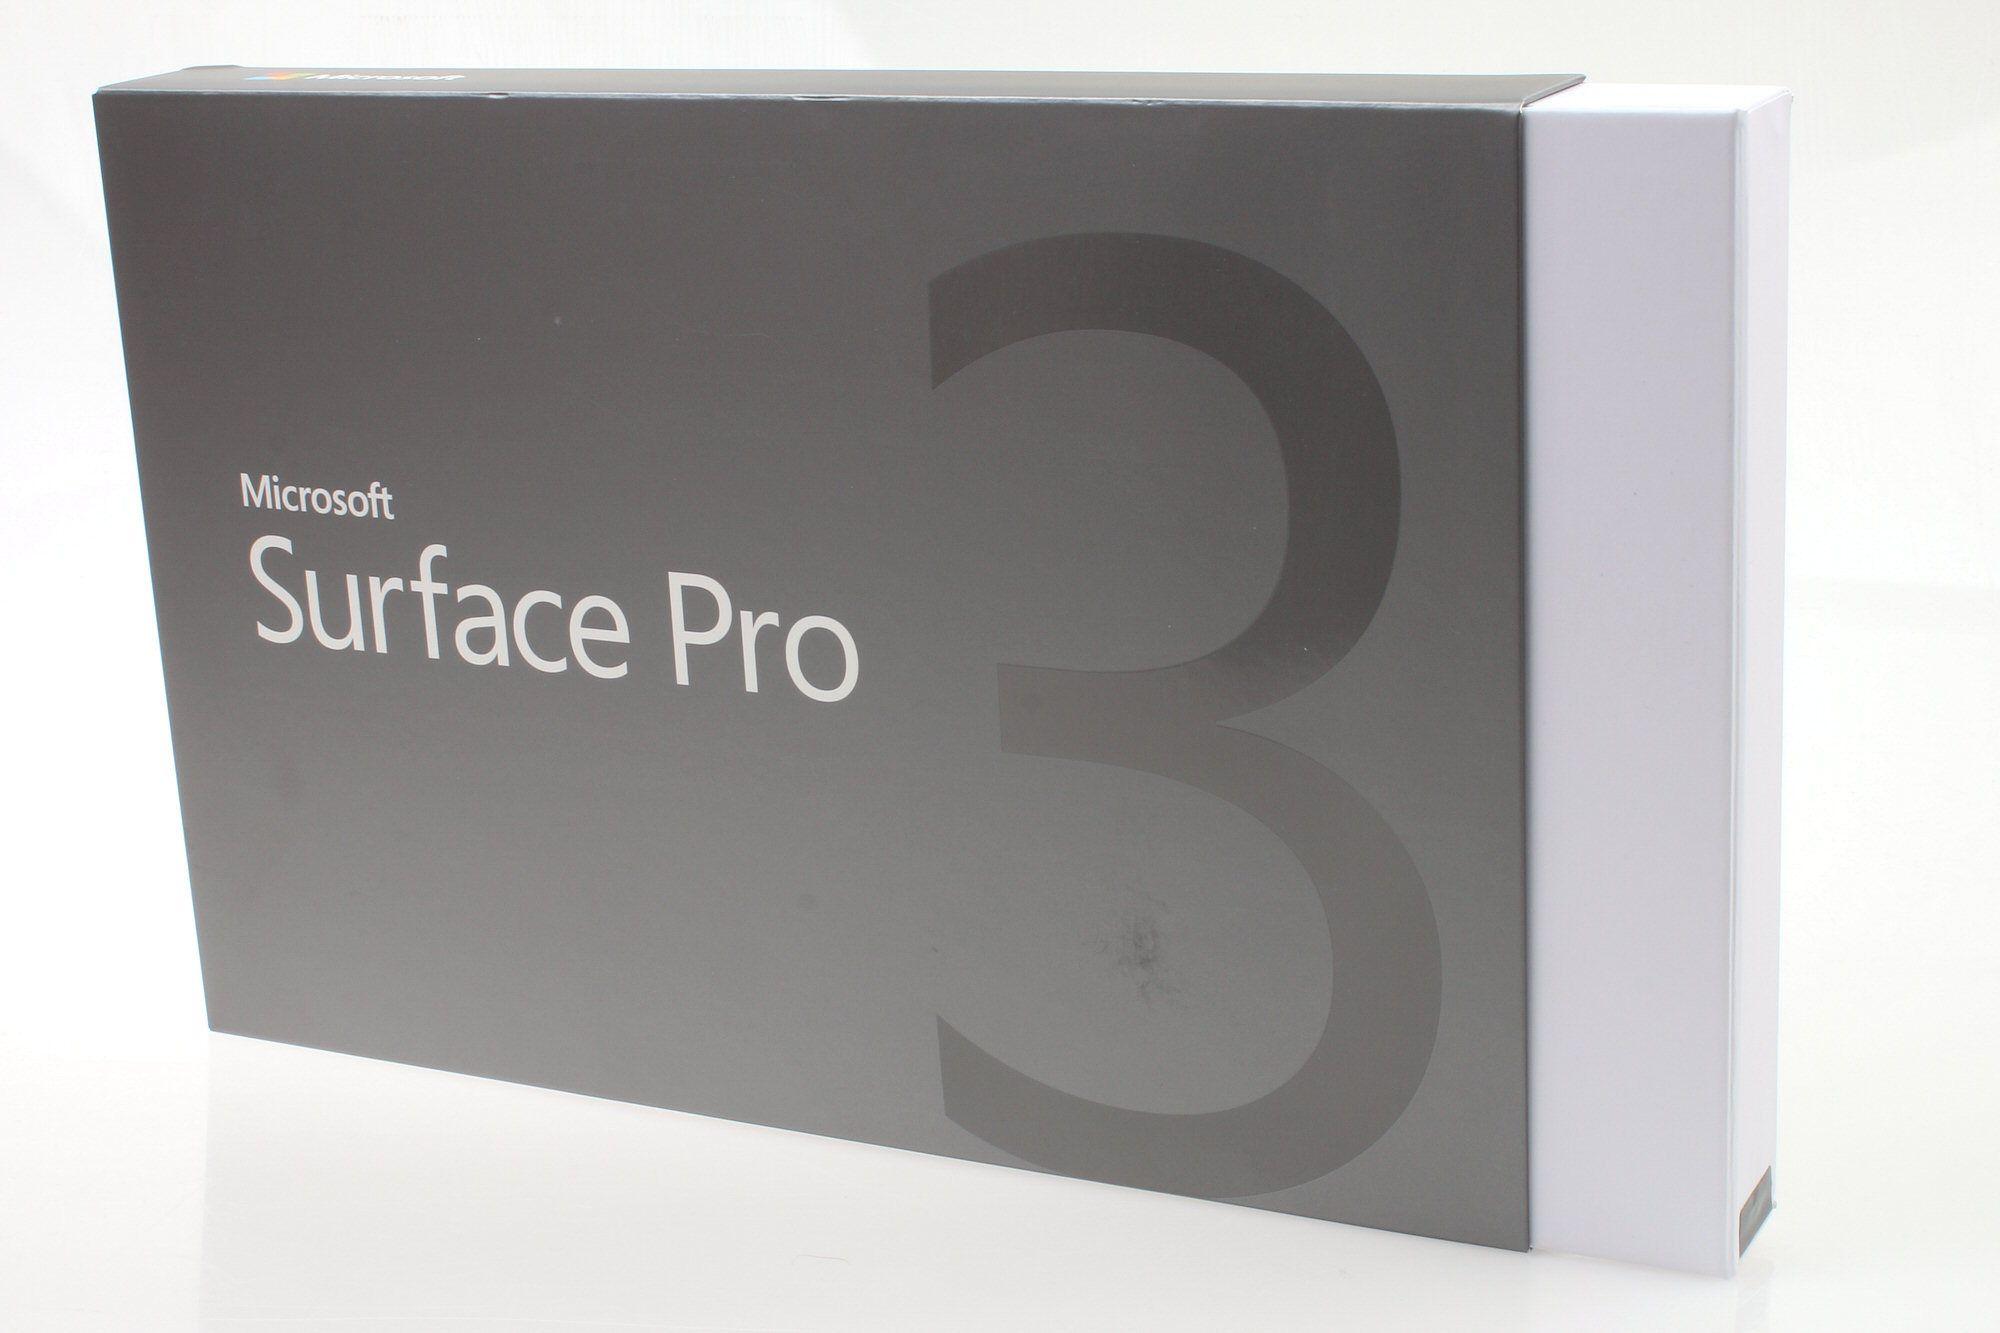 Microsoft Surface Pro 3 i innpakket tilstand.Foto: Vegar Jansen, Hardware.no